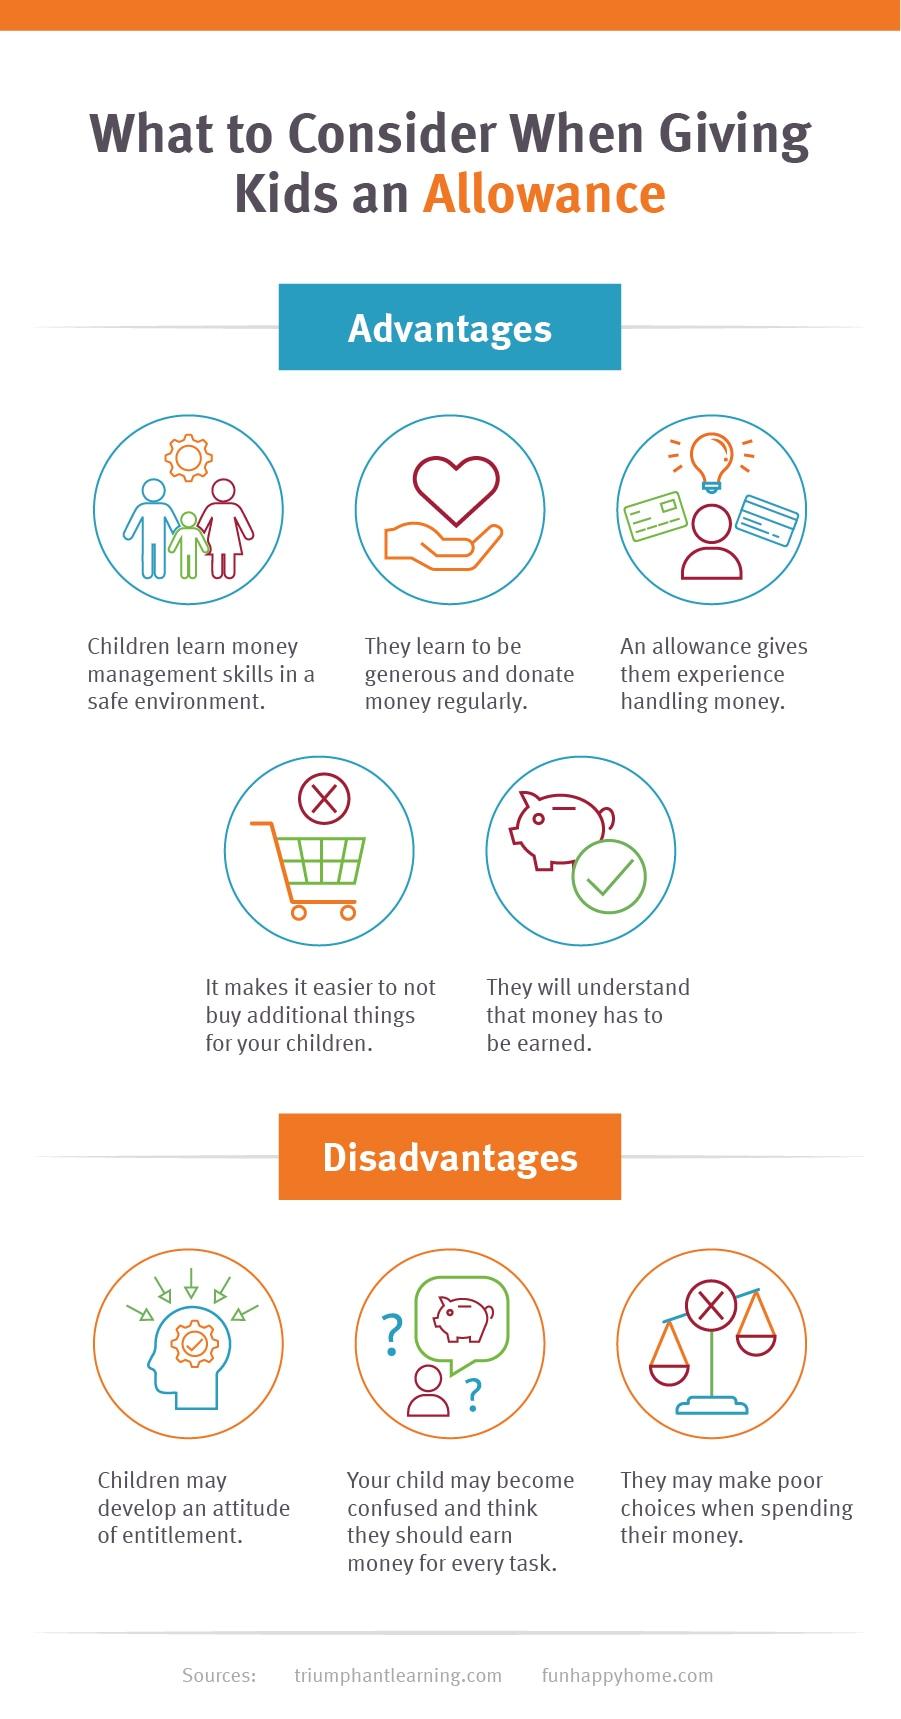 What to Consider When Giving Kids an Allowance